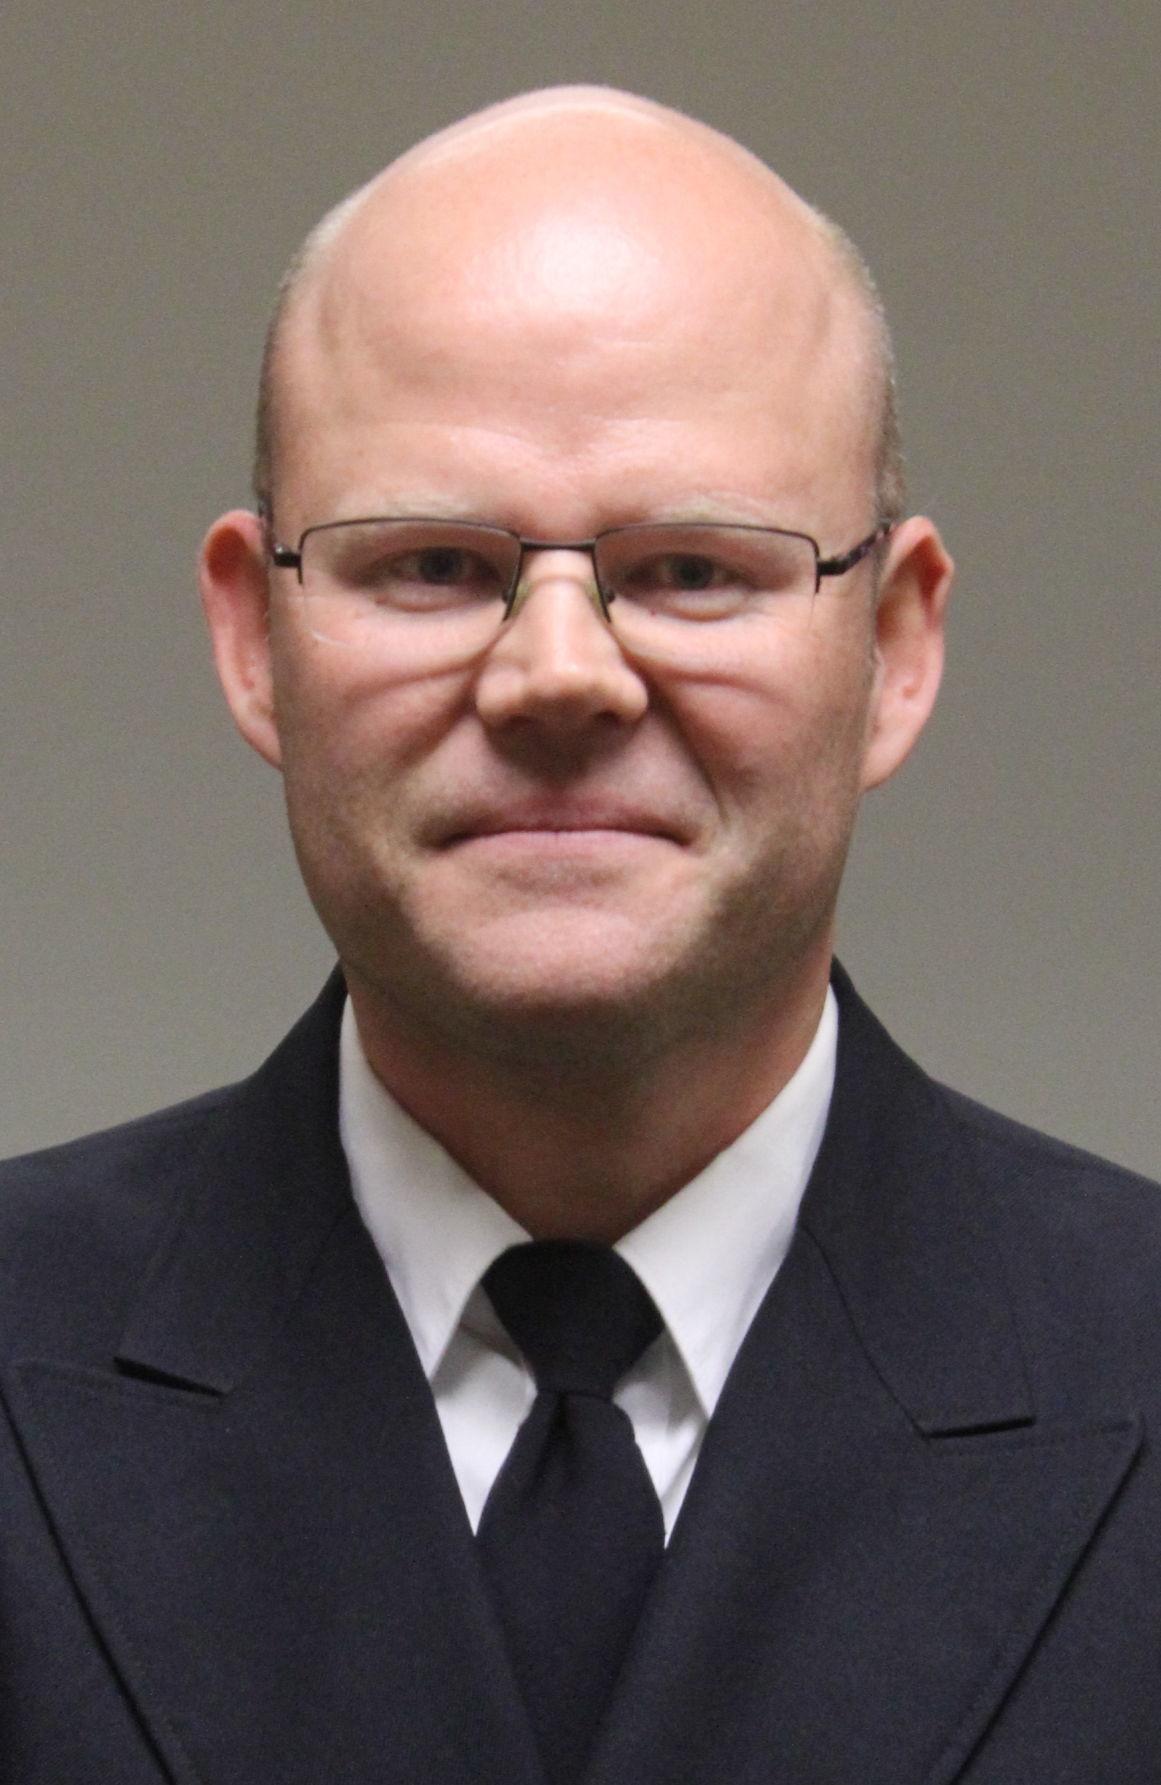 Jeremy McKinley headshot